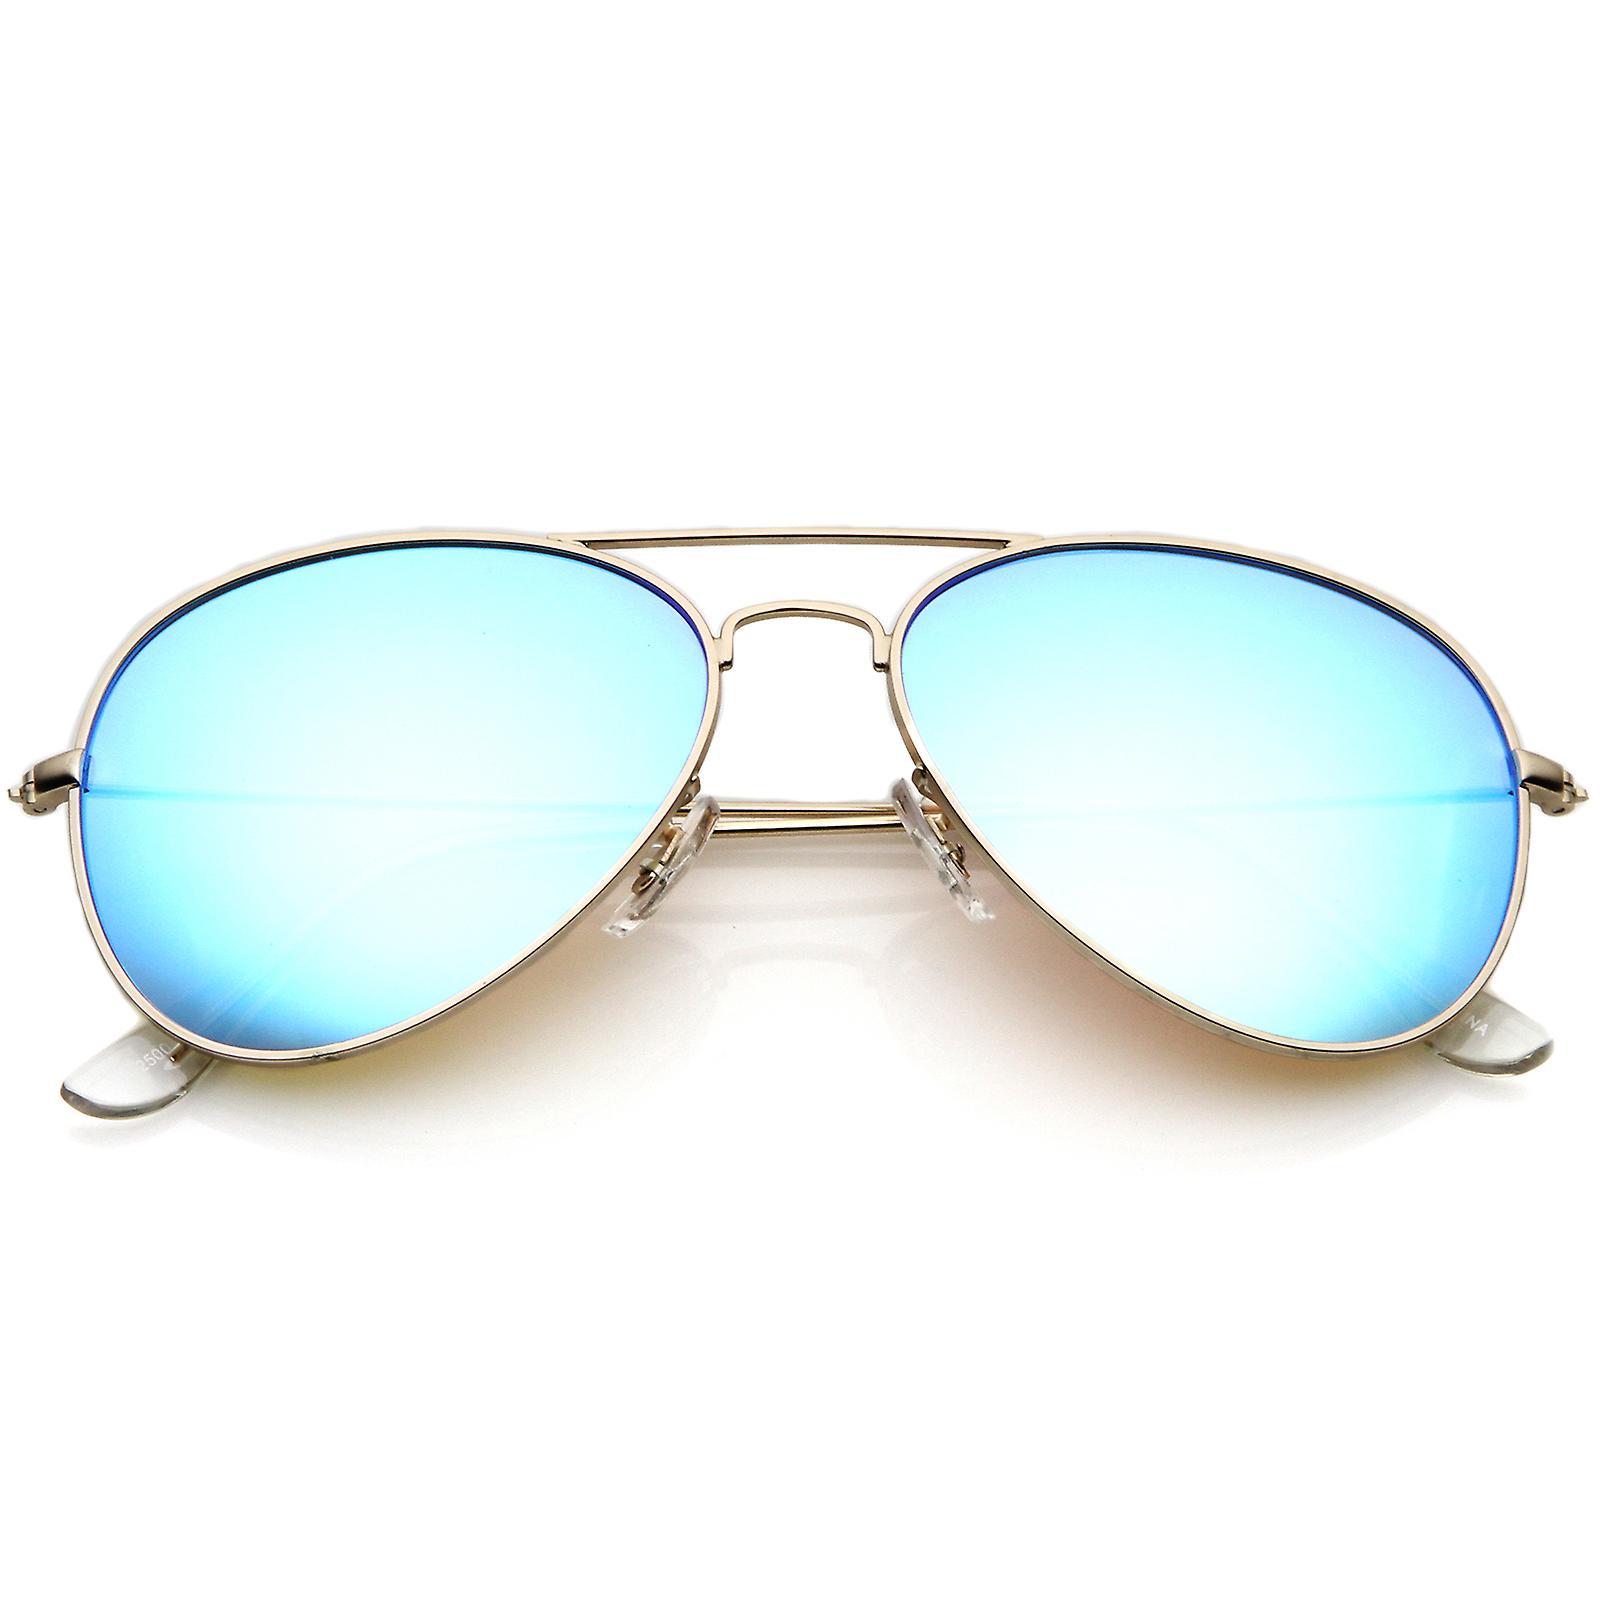 ec36510d3e Premium Nickel Plated Frame Multi-Coated Mirror Lens Aviator Sunglasses 59mm